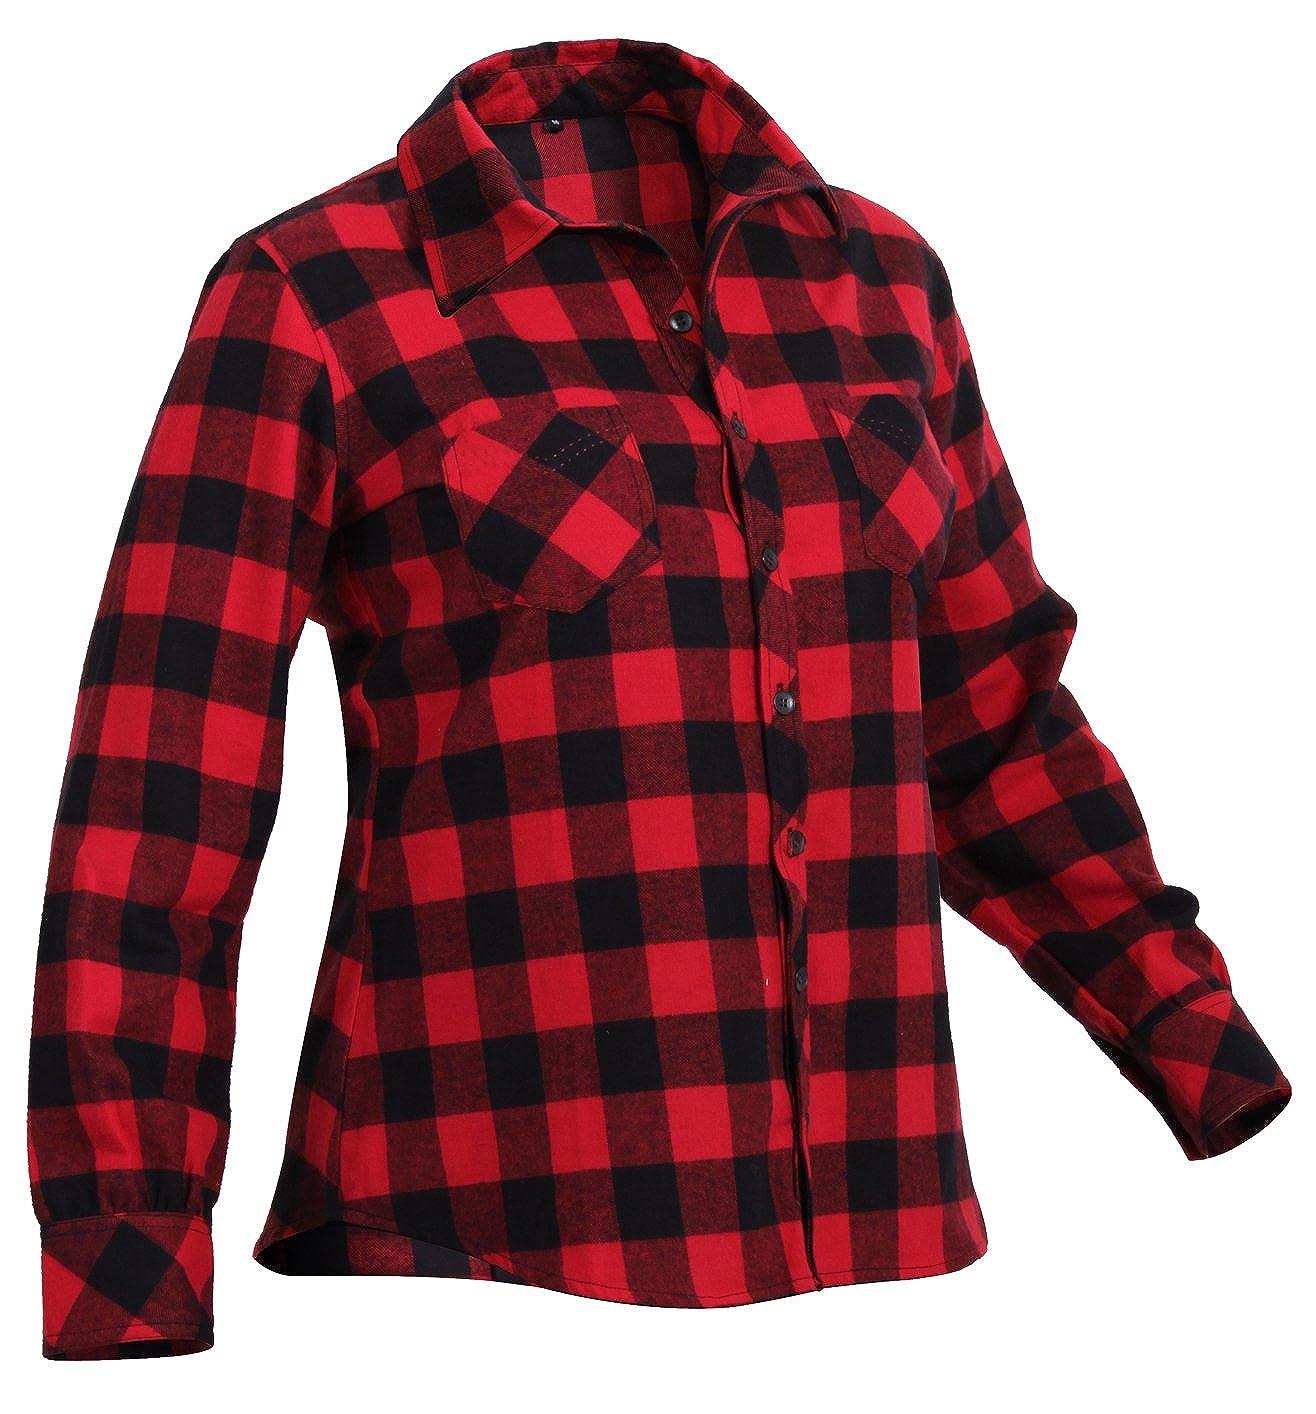 Amazon.com: Rothco Womens Plaid Flannel Shirt: Sports & Outdoors